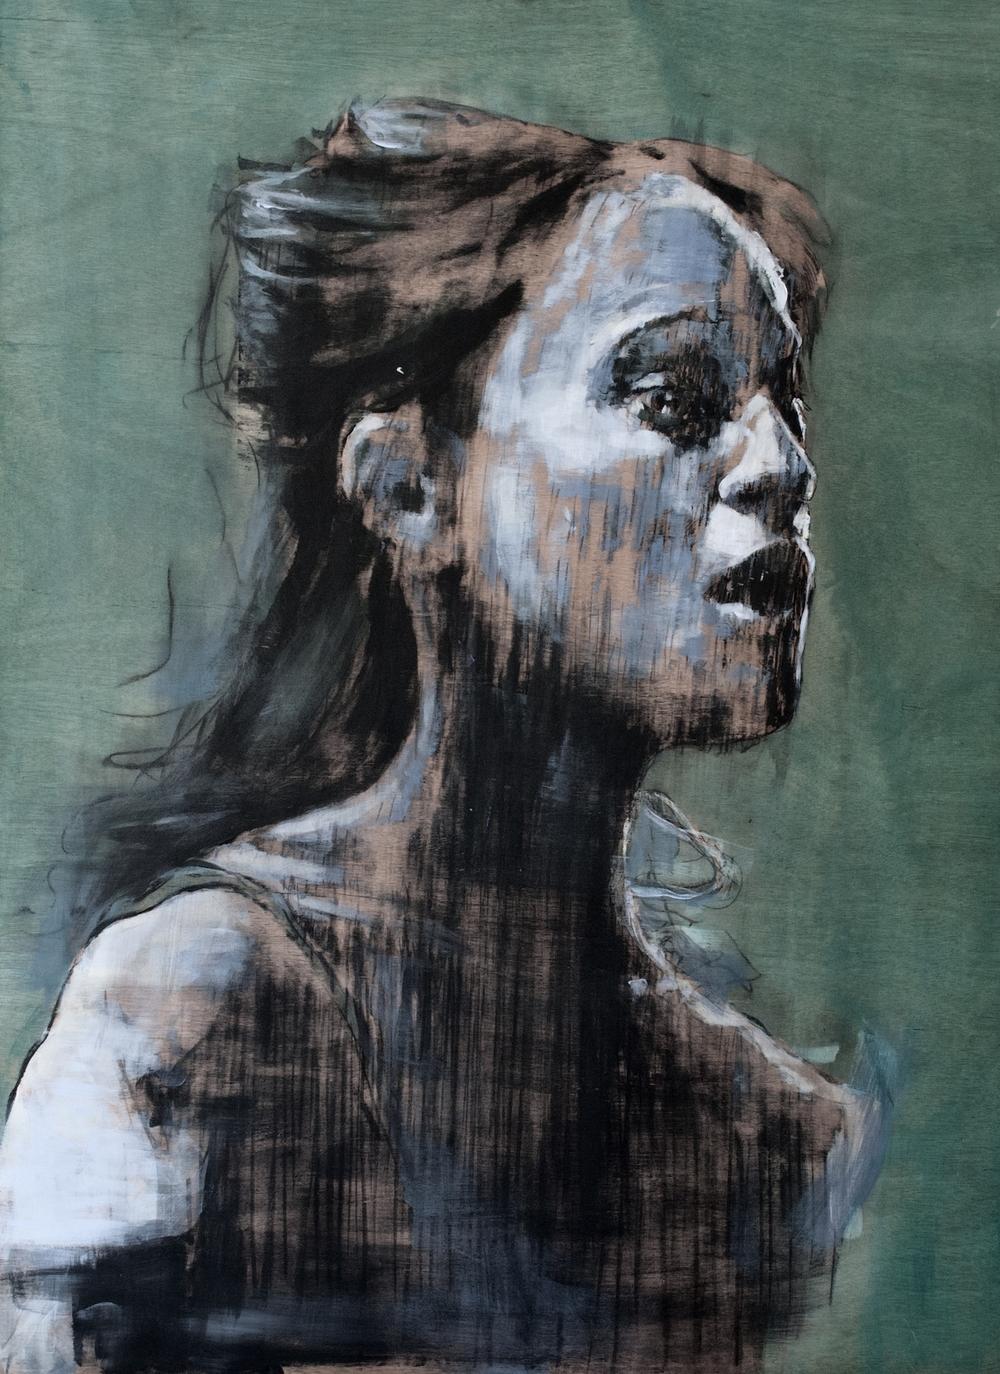 acrylic on wood  81 x 60 cm  2012